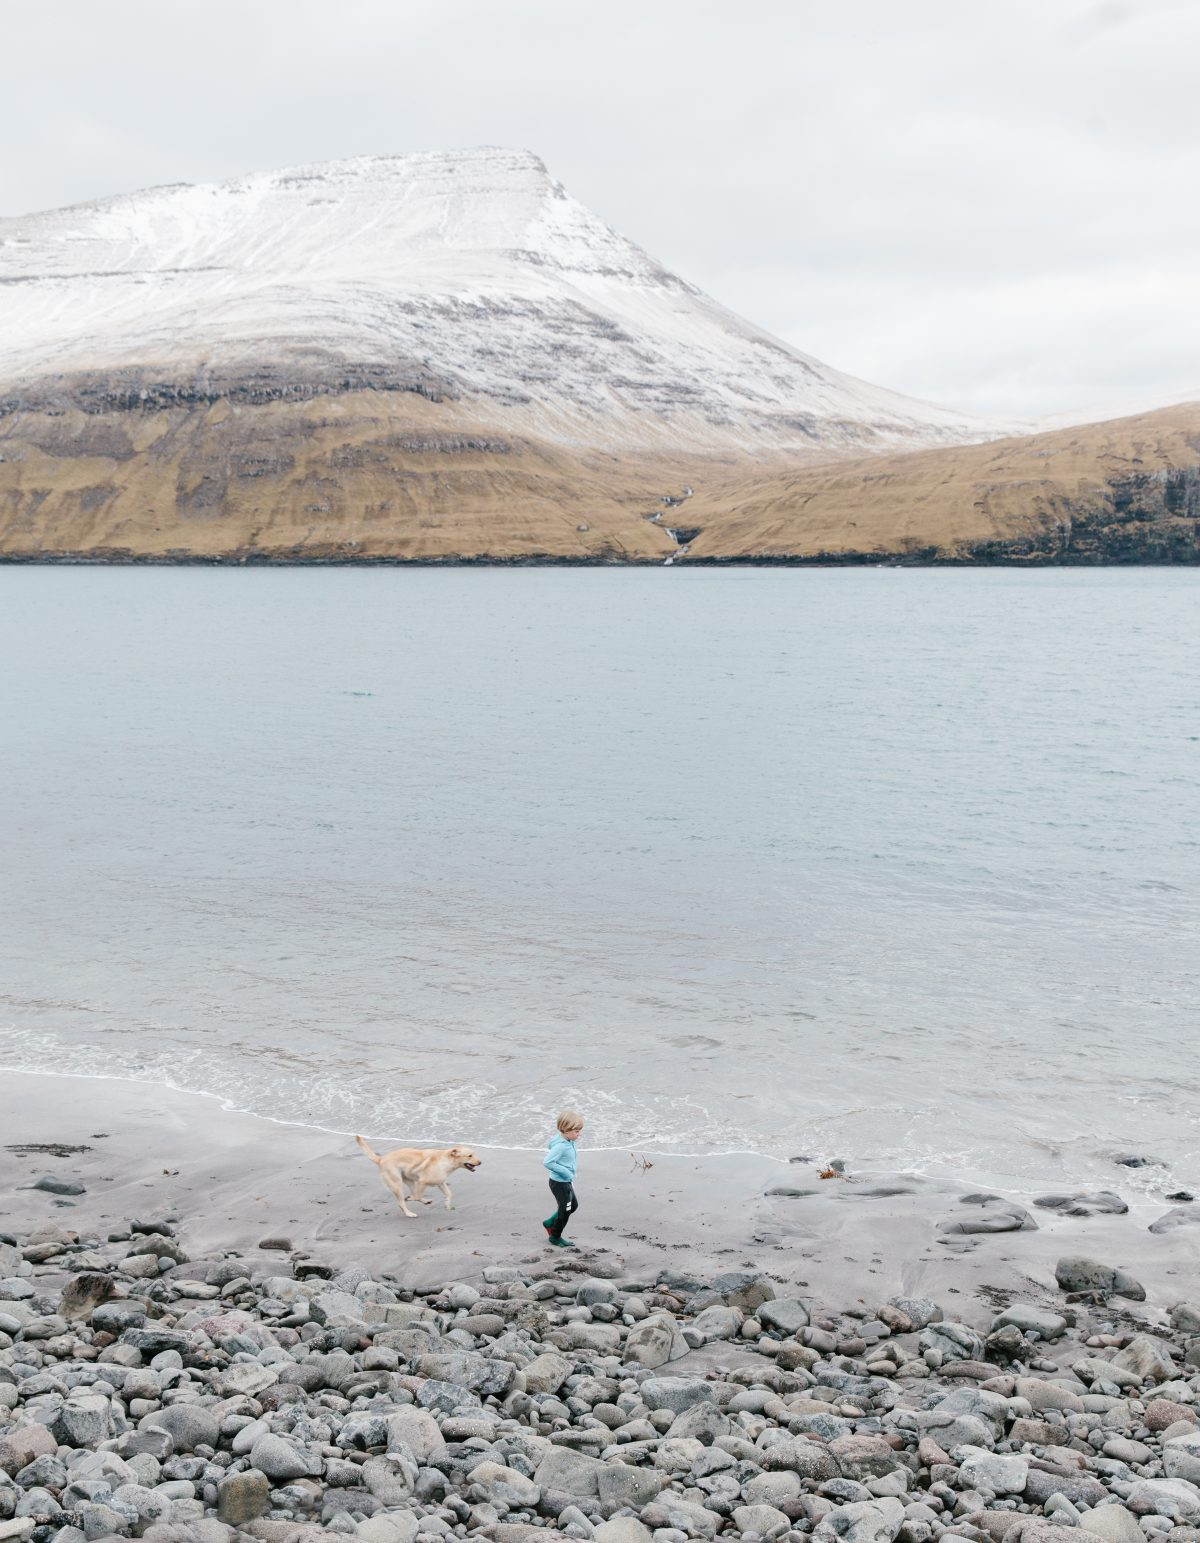 Child and dog, Faroe Islands, 2016